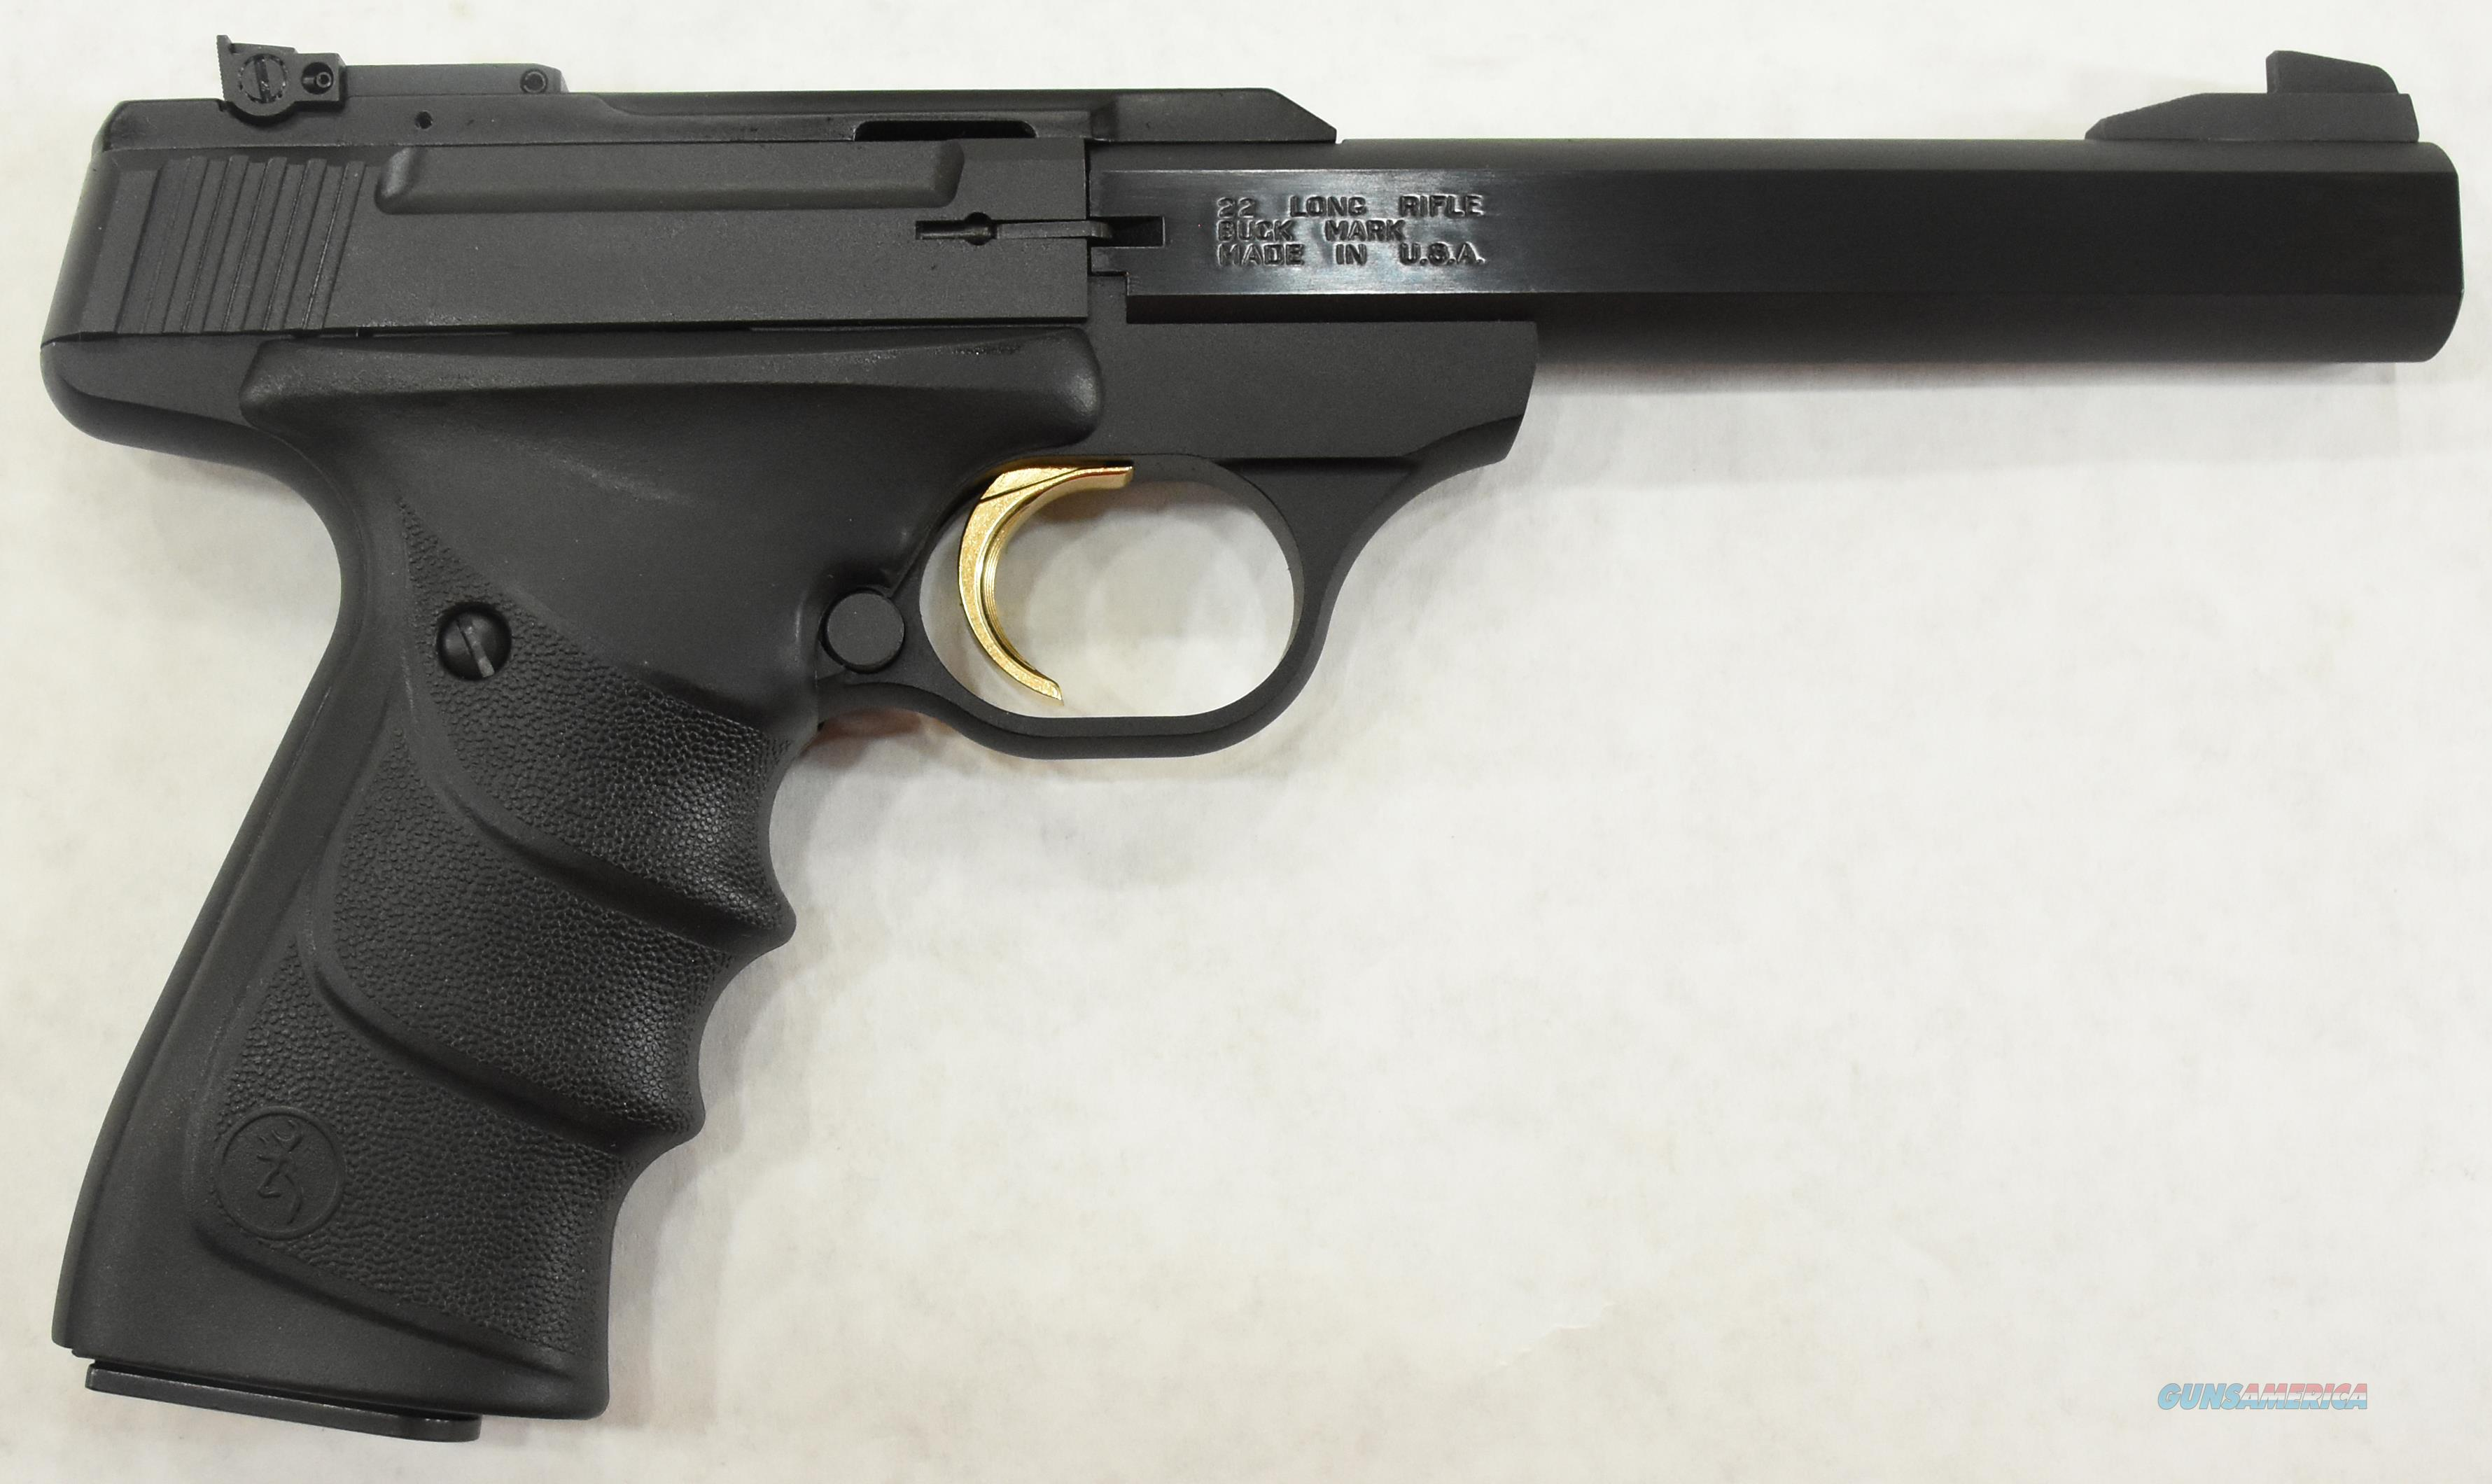 Buck Mark Standard URX Adj 22LR 5.5In 051497490  Guns > Pistols > Browning Pistols > Buckmark